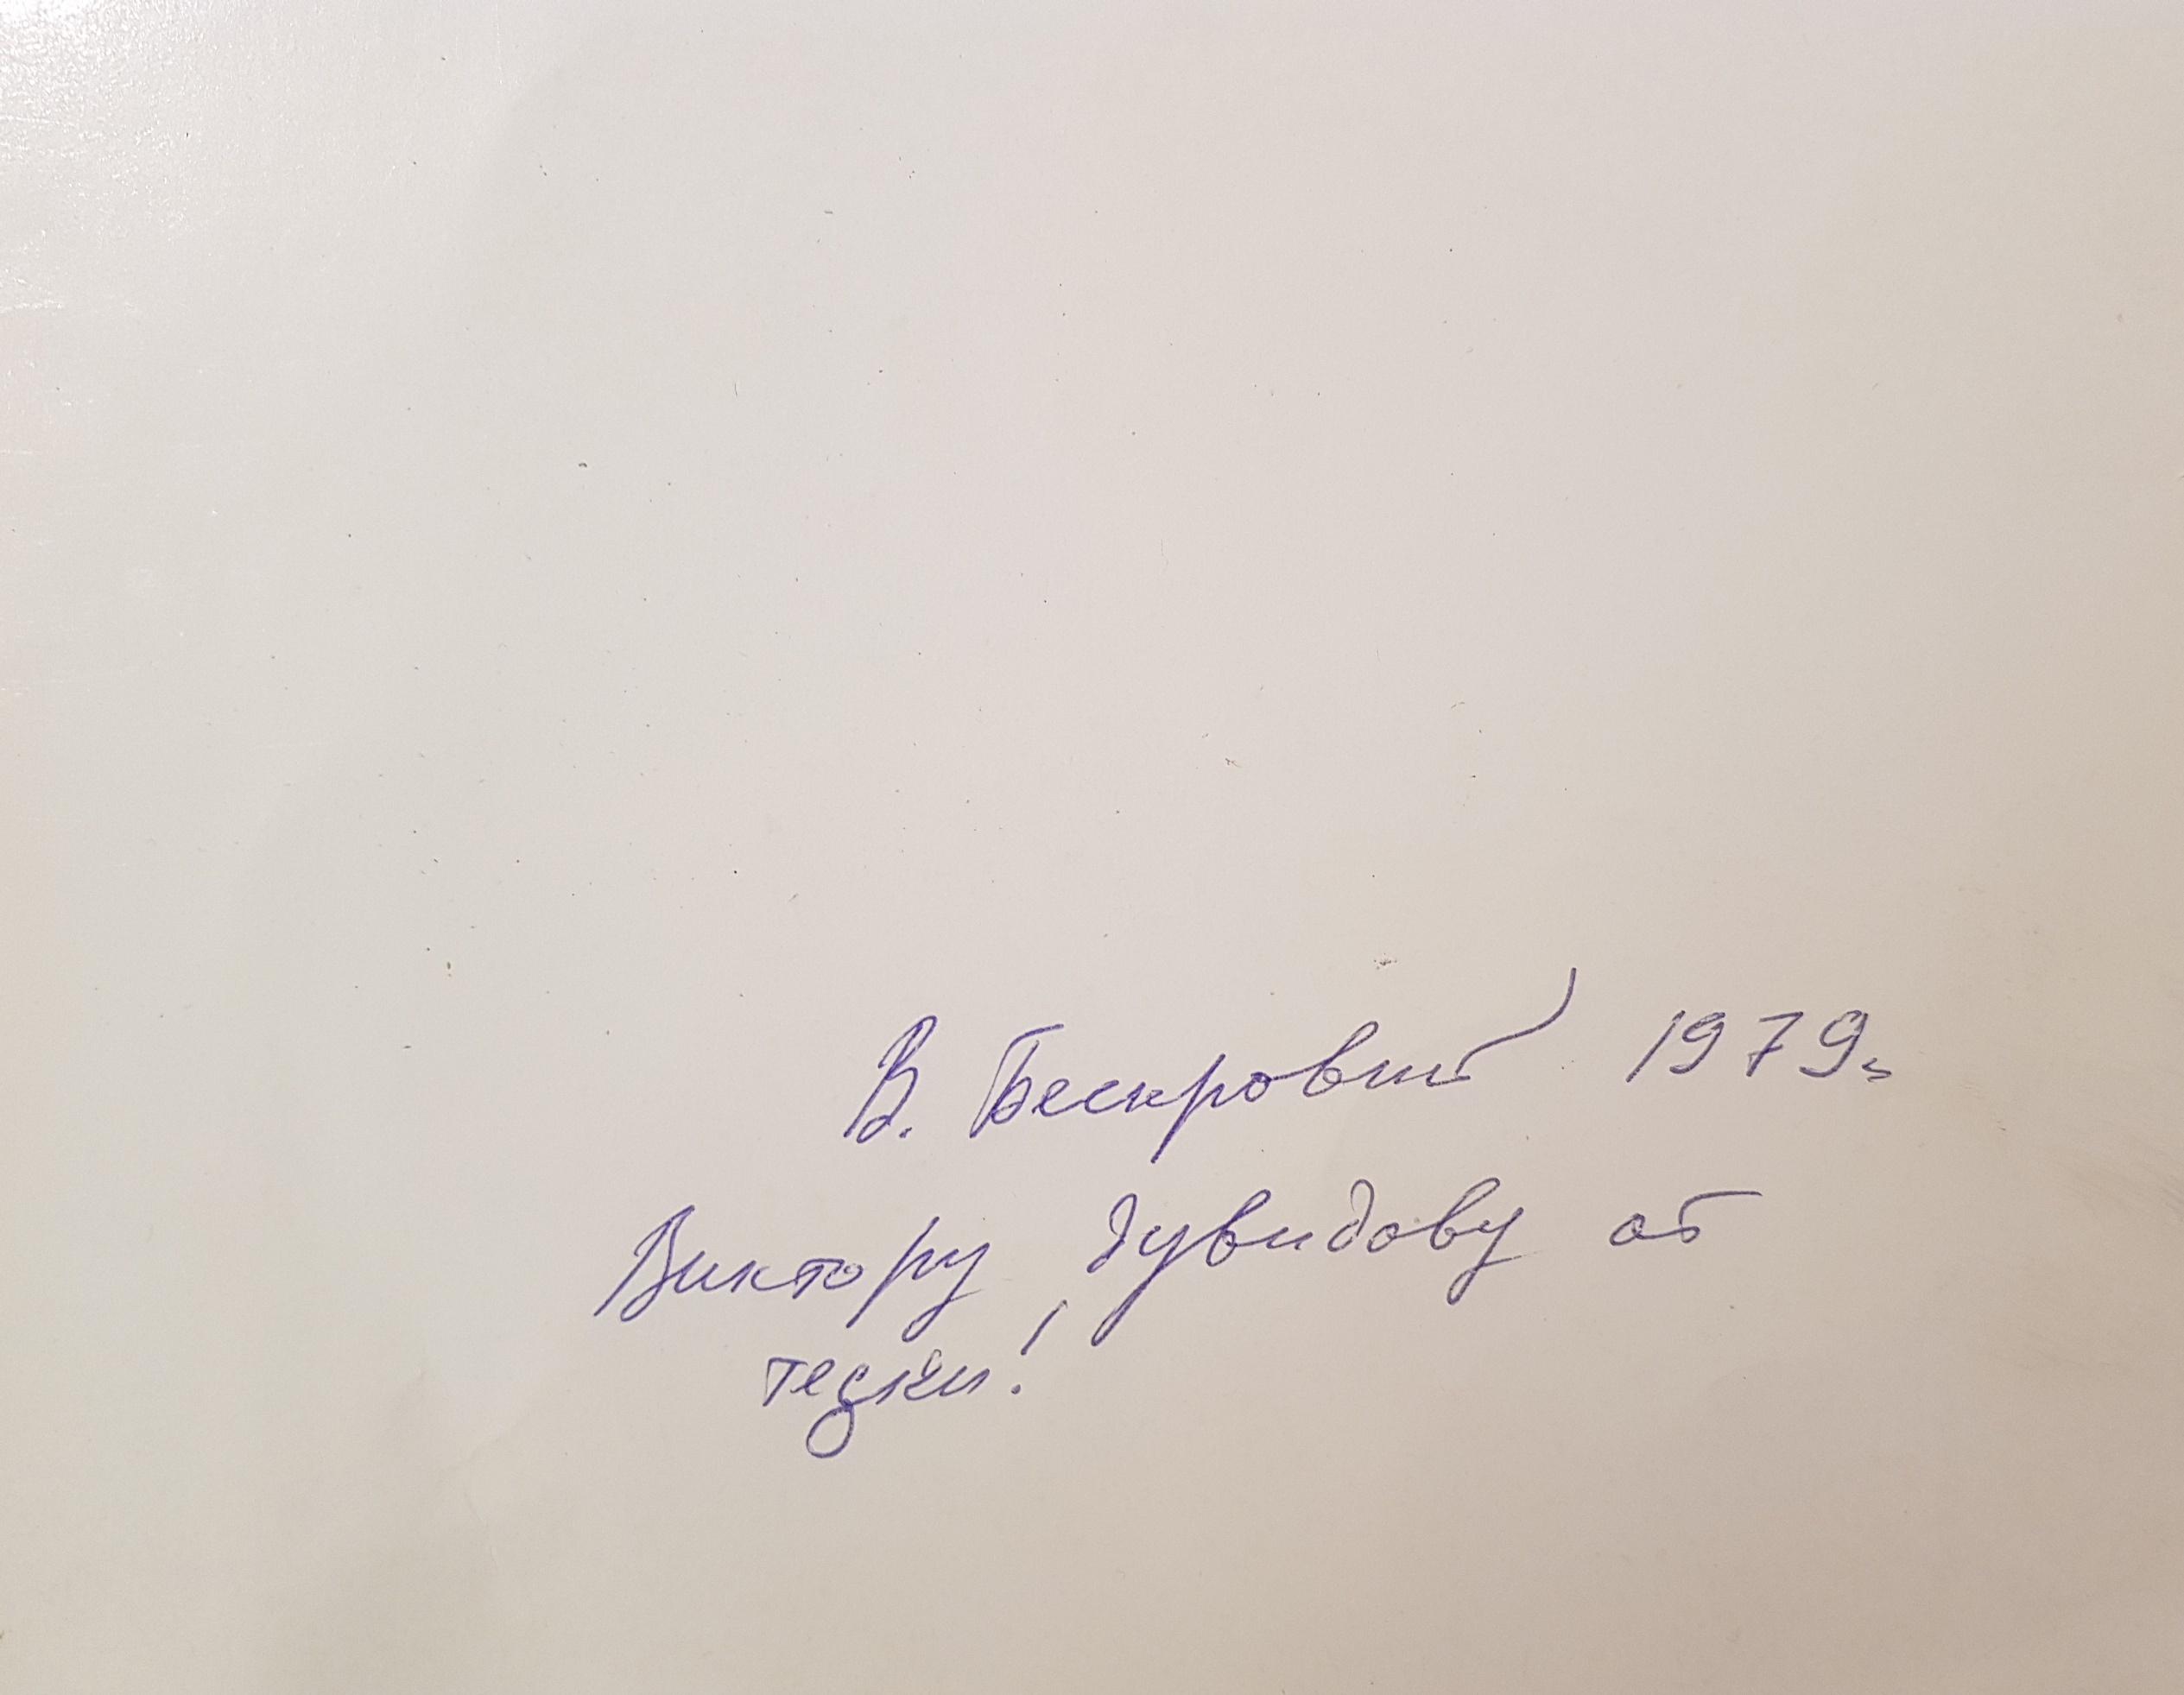 Подпись. Бескровий Виктор. Кунг-Фу